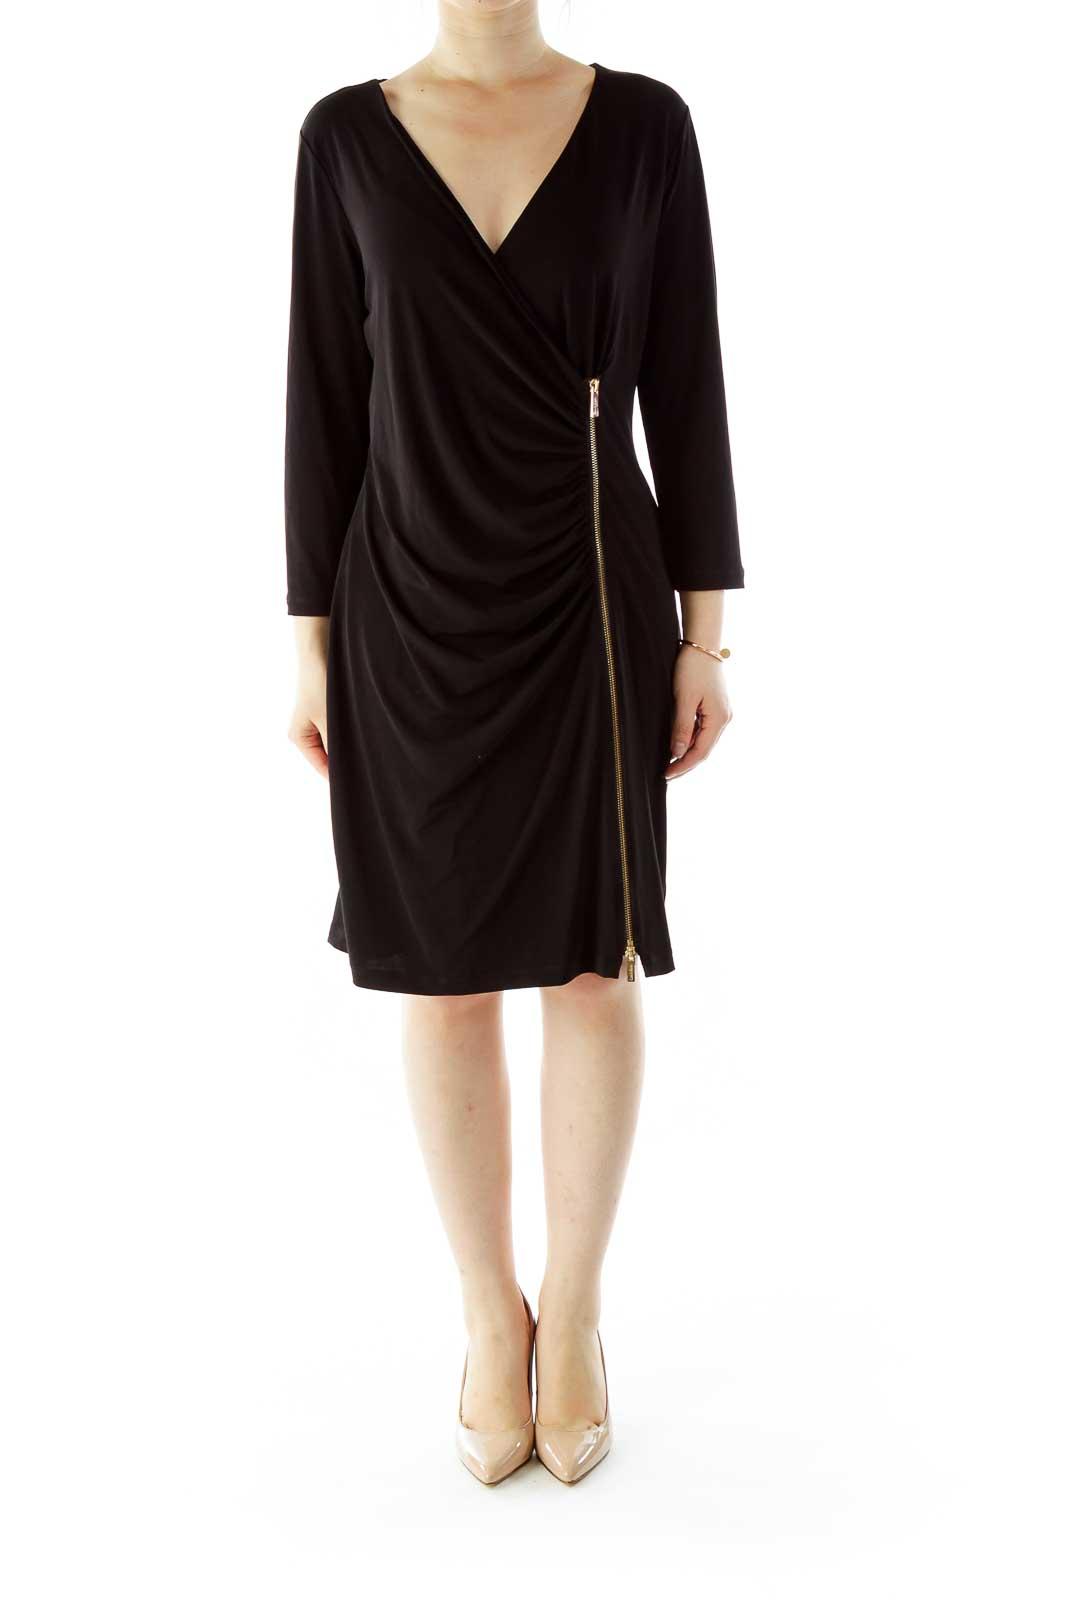 Black Zippered V-Neck Work Dress